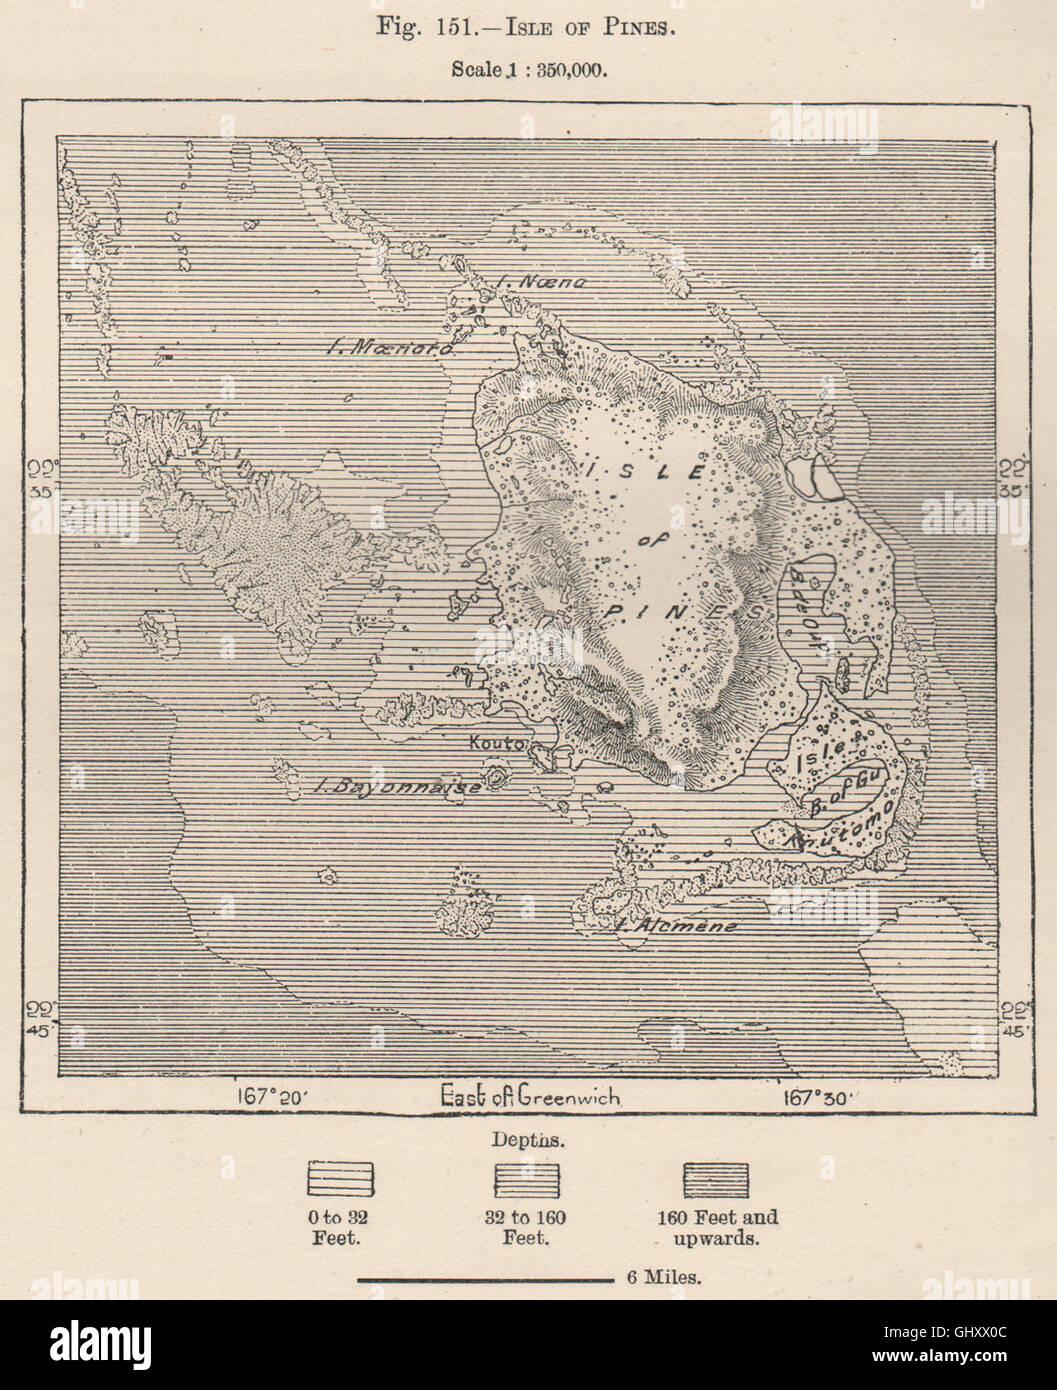 Isle of Pines. New Caledonia. Melanesia, 1885 antique mapStock Photo